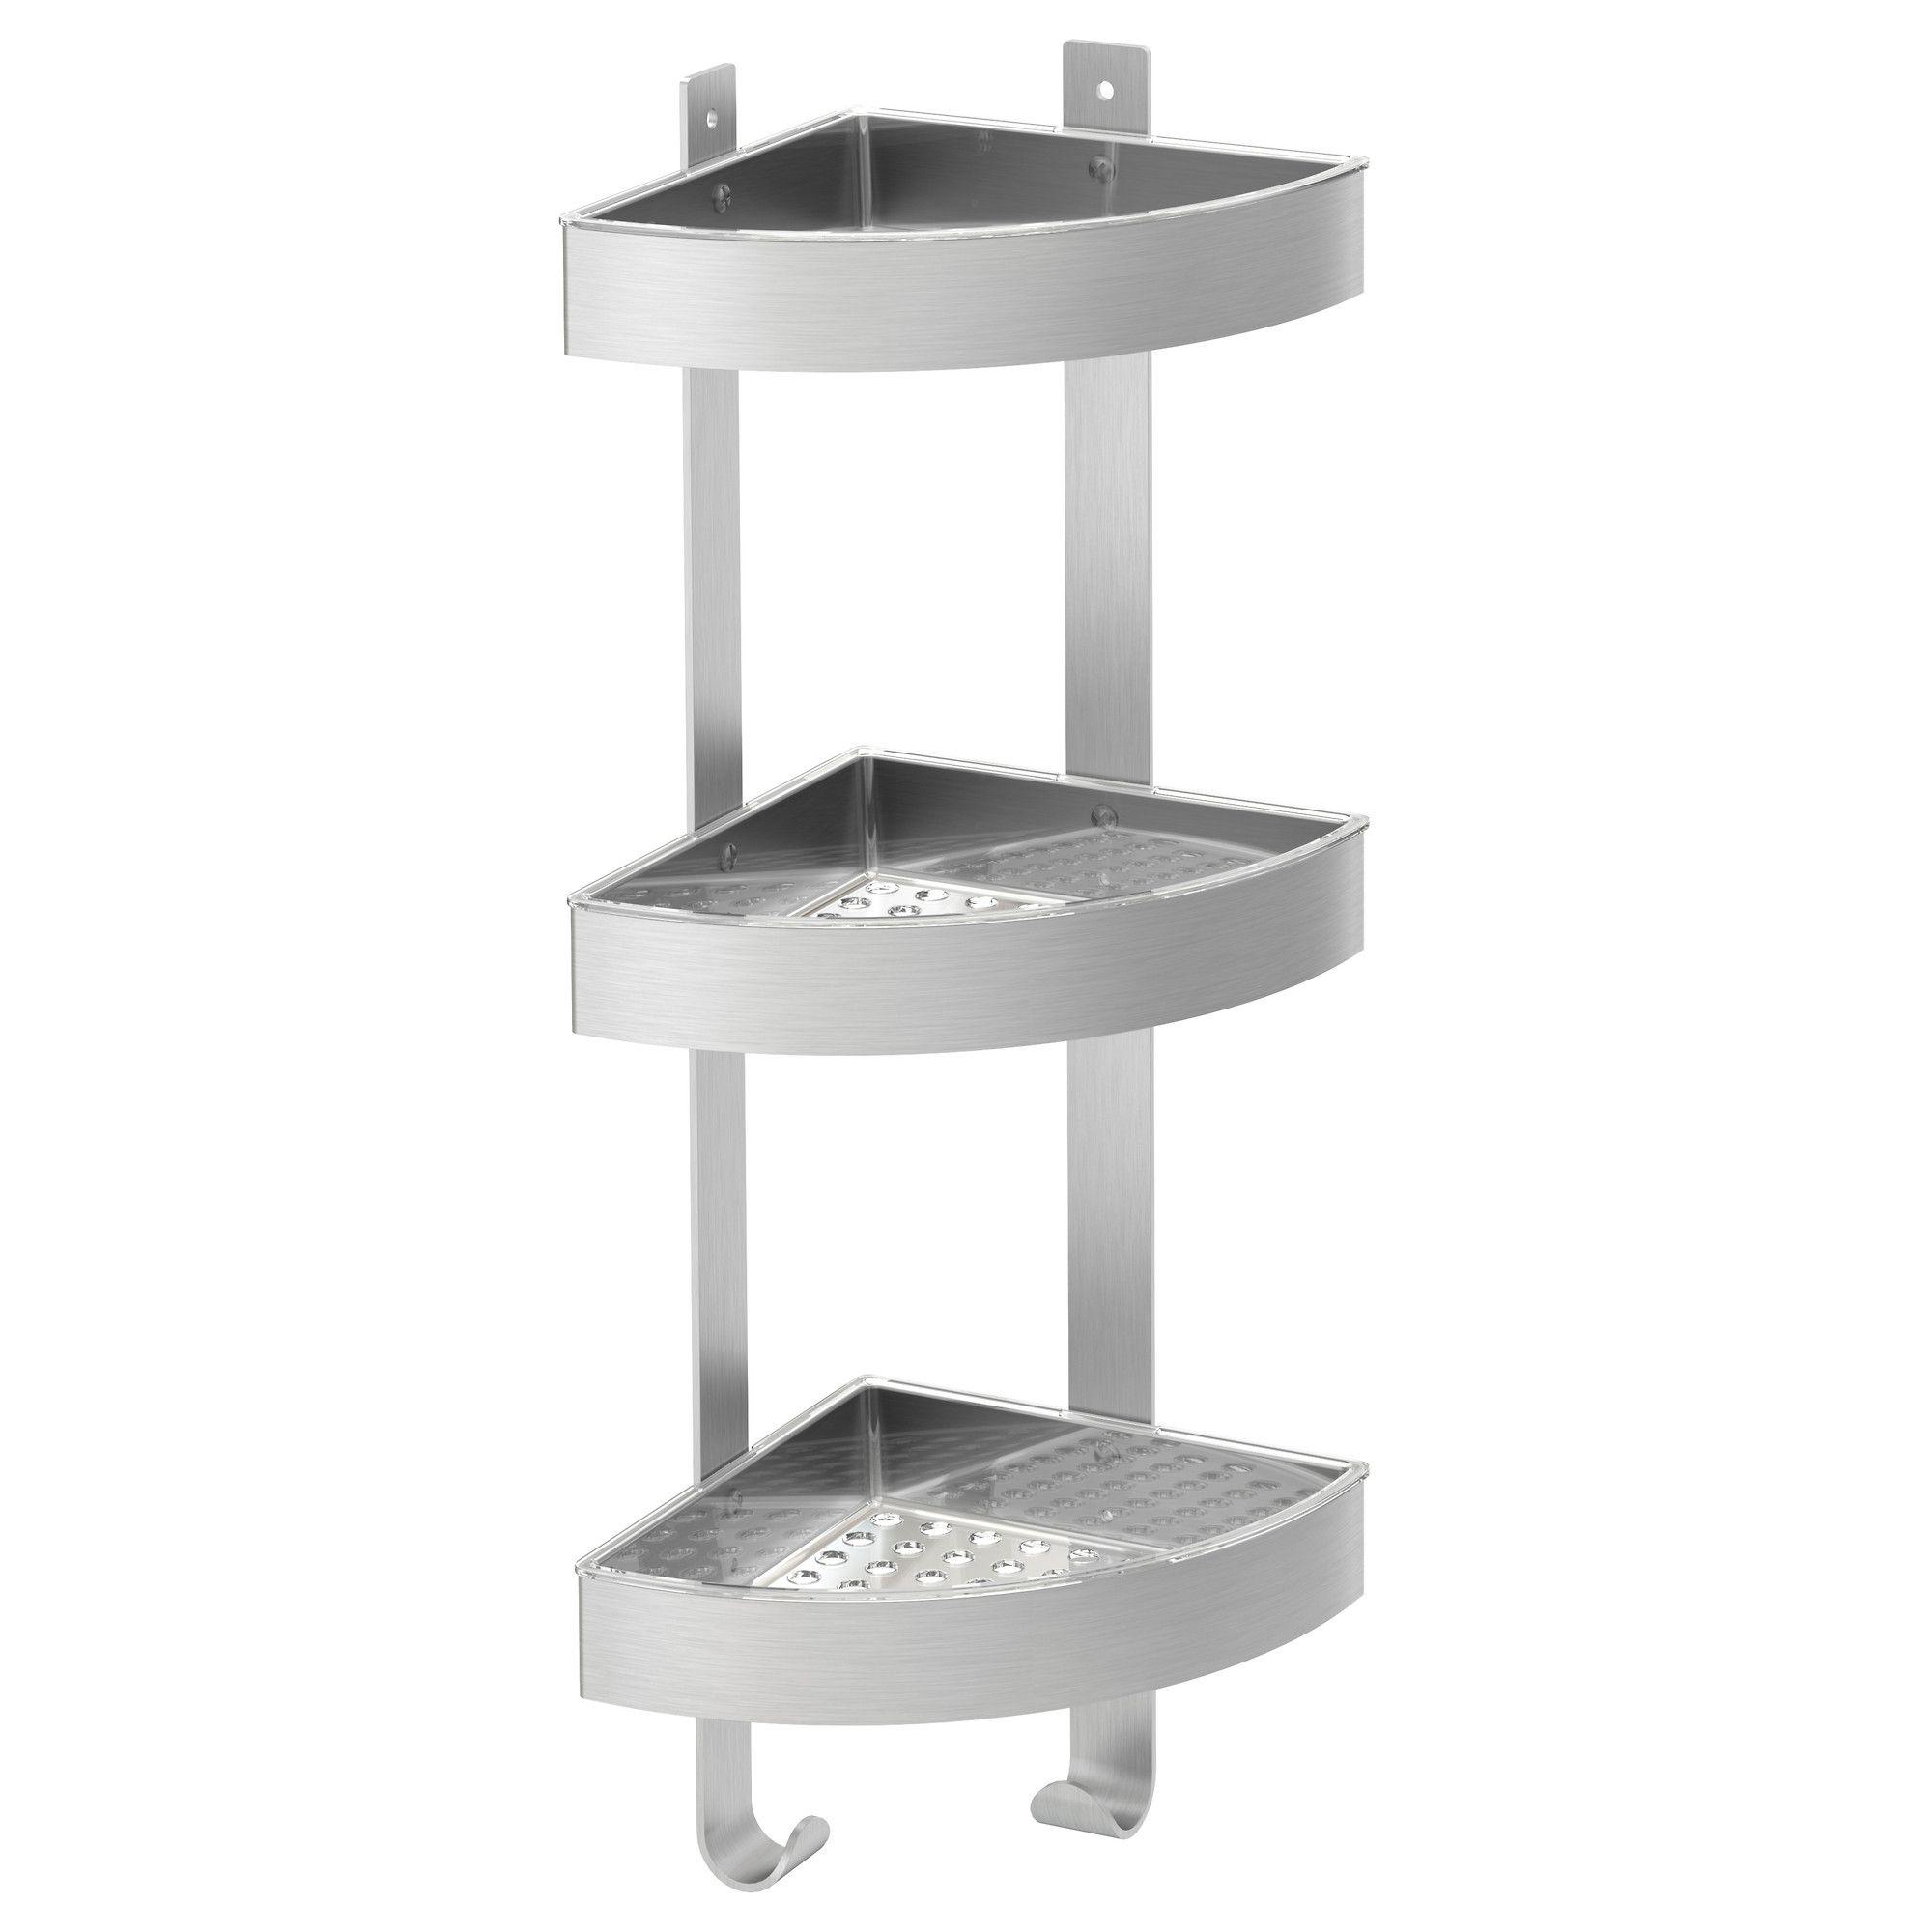 Ikea Us Furniture And Home Furnishings Corner Wall Shelf Unit